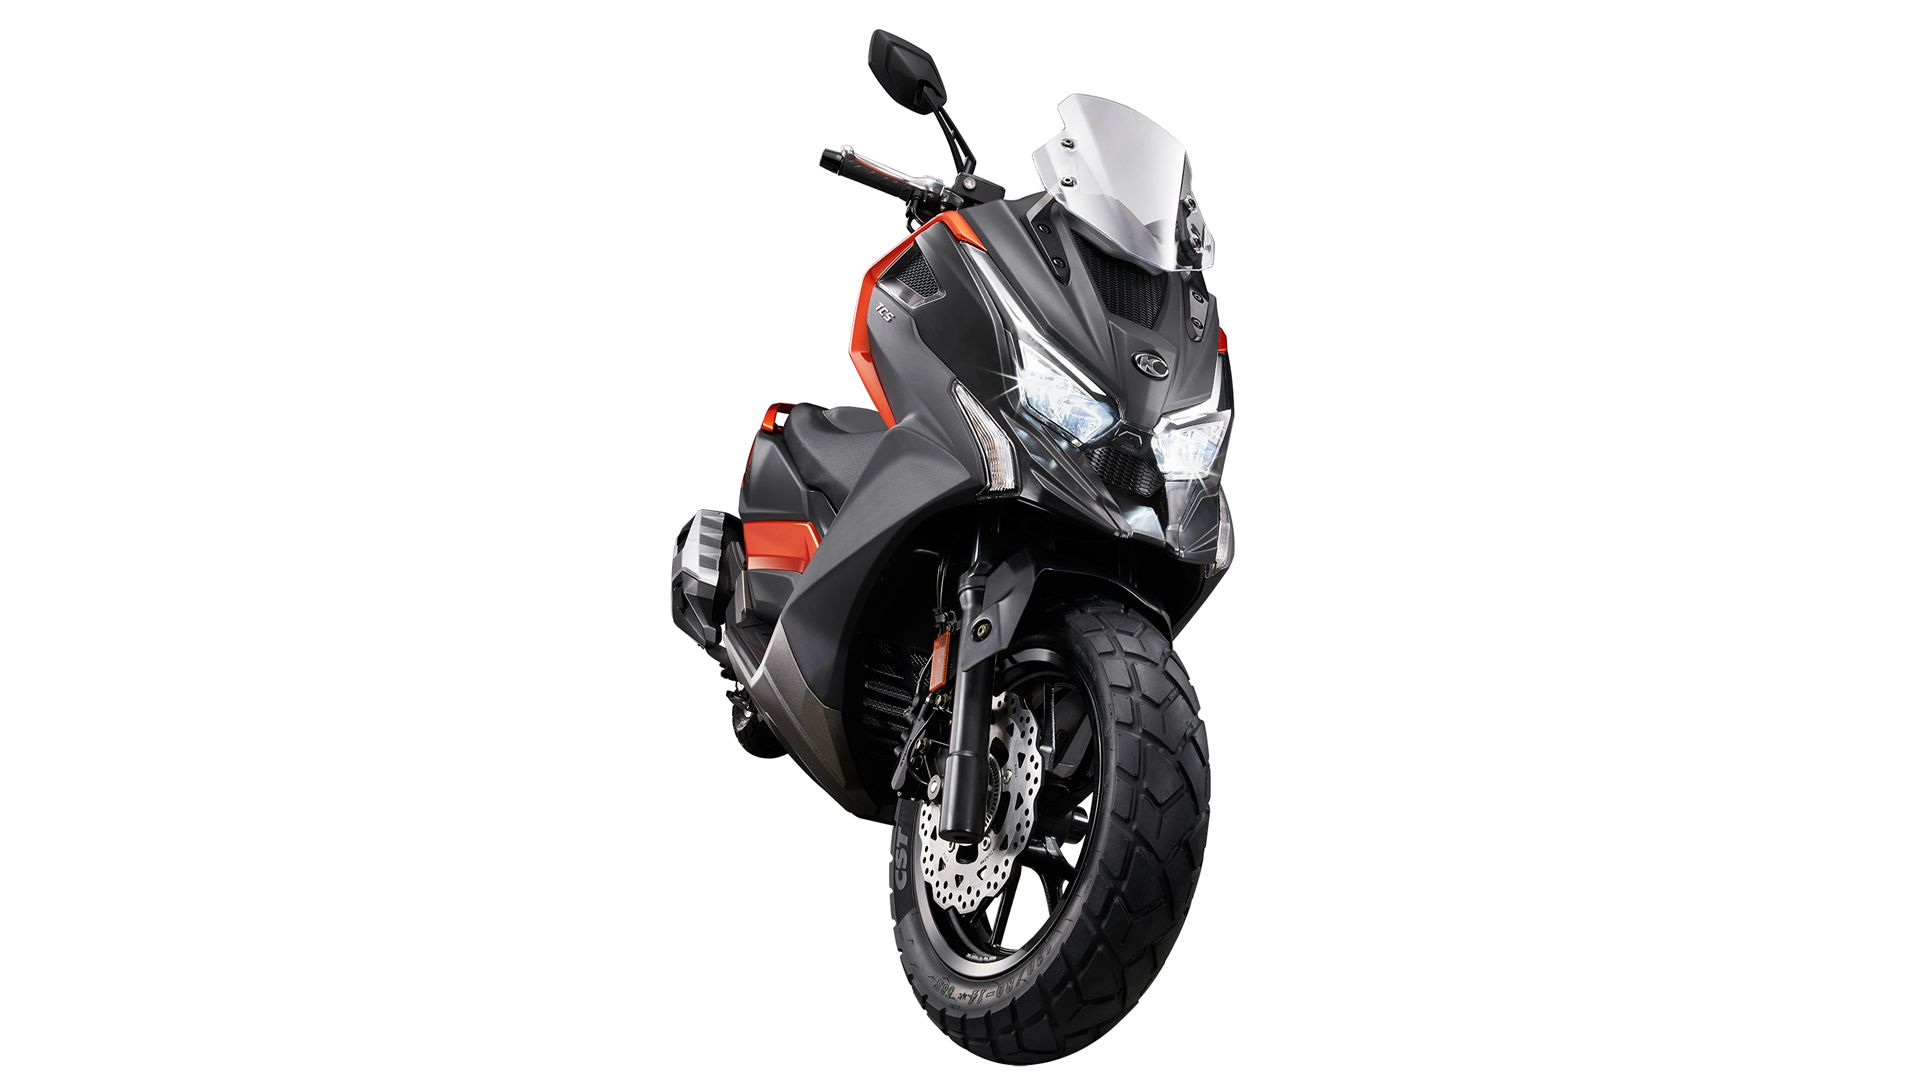 2021-kymco-dt-x360-adventure-scooter-specs-16 - BikesRepublic